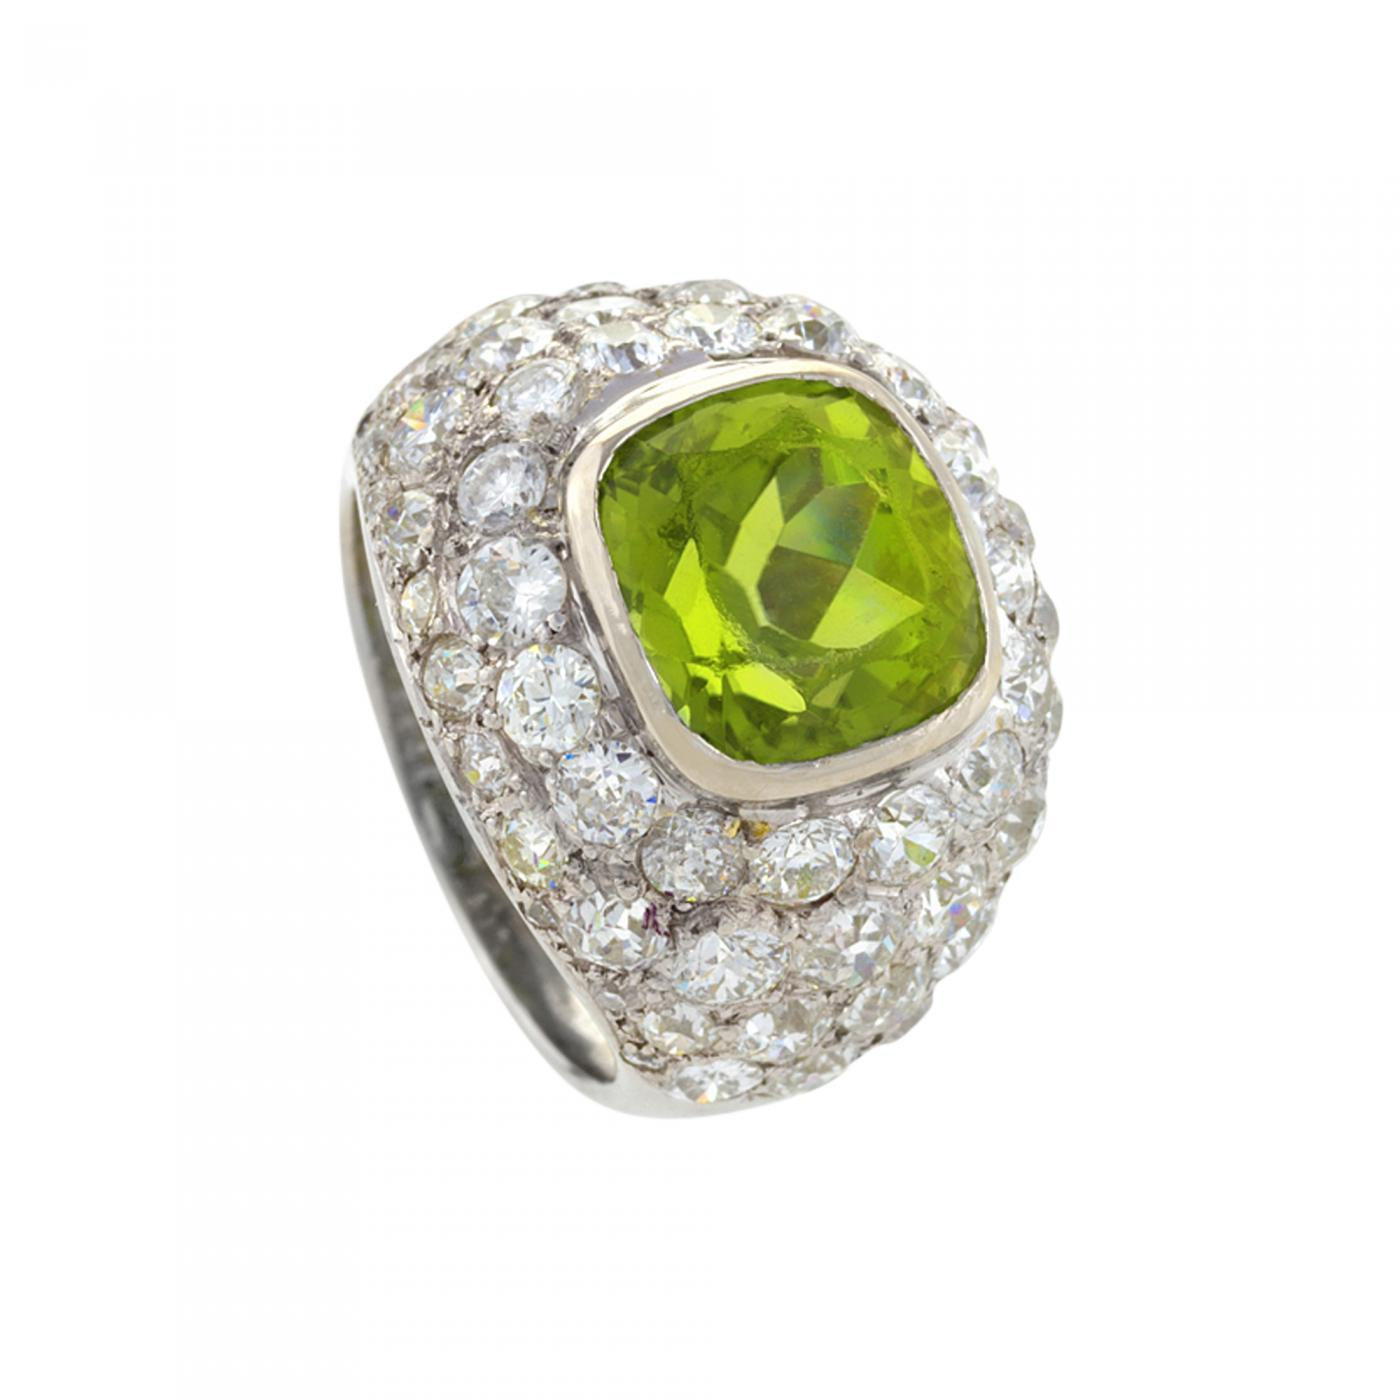 b2d41f2fe4 René Boivin Art Deco Platinum, Peridot and Diamond Ring